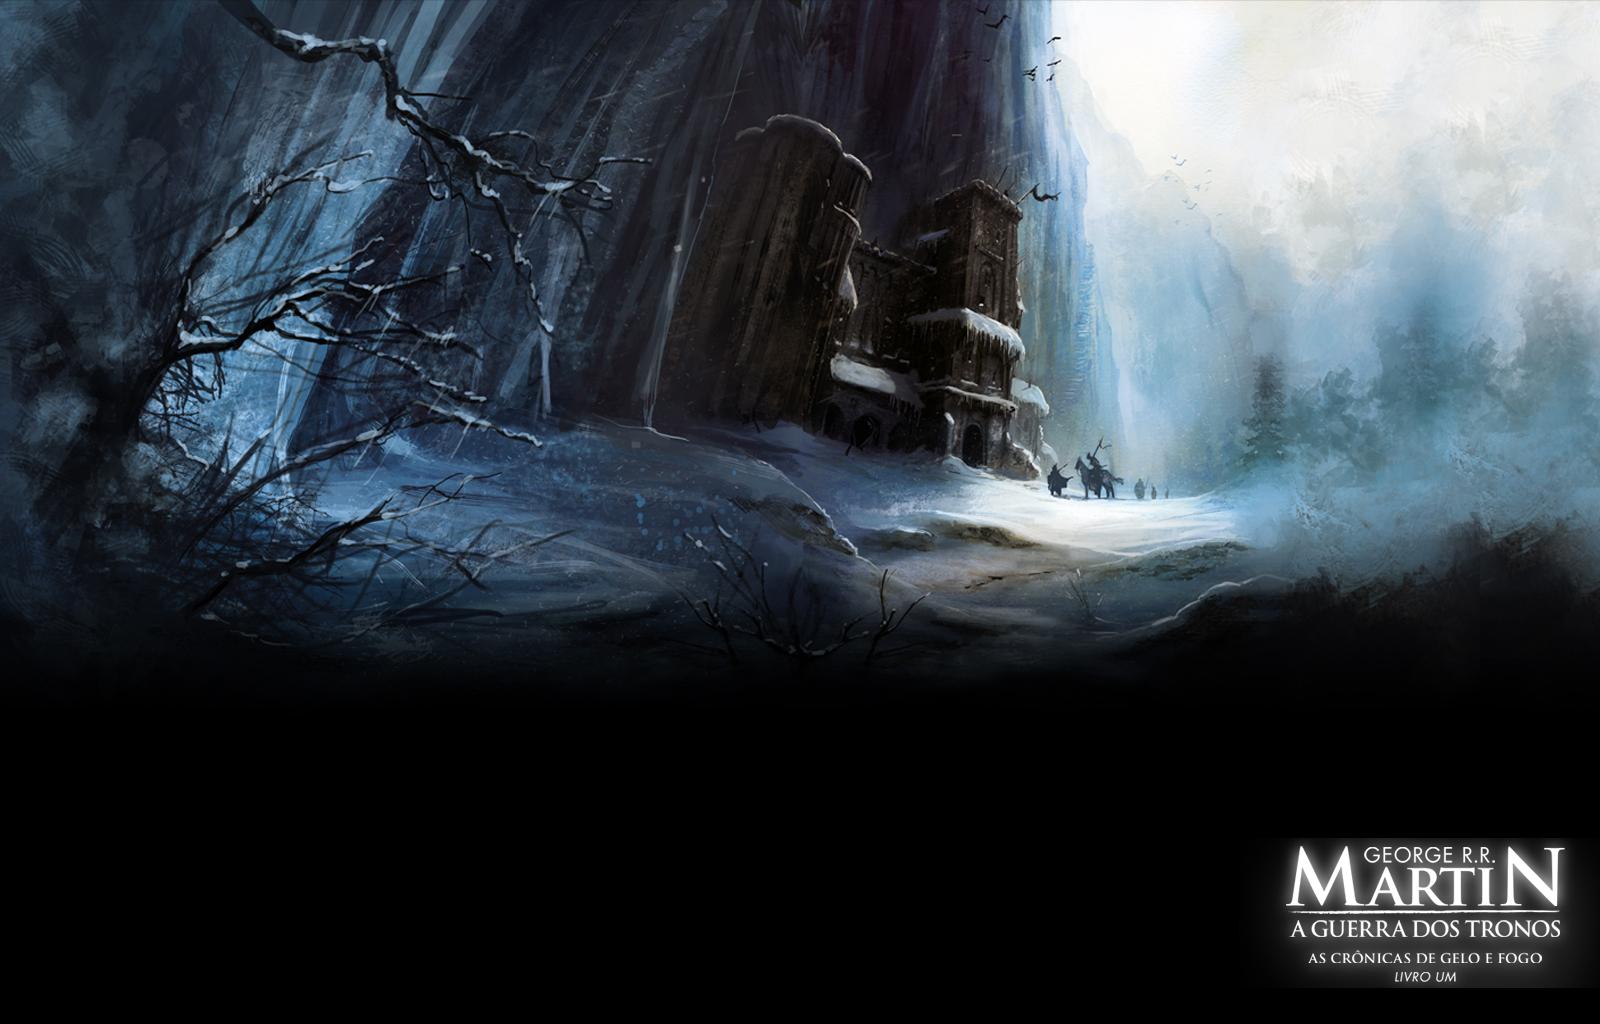 A game of thrones brazilian cover art.jpg